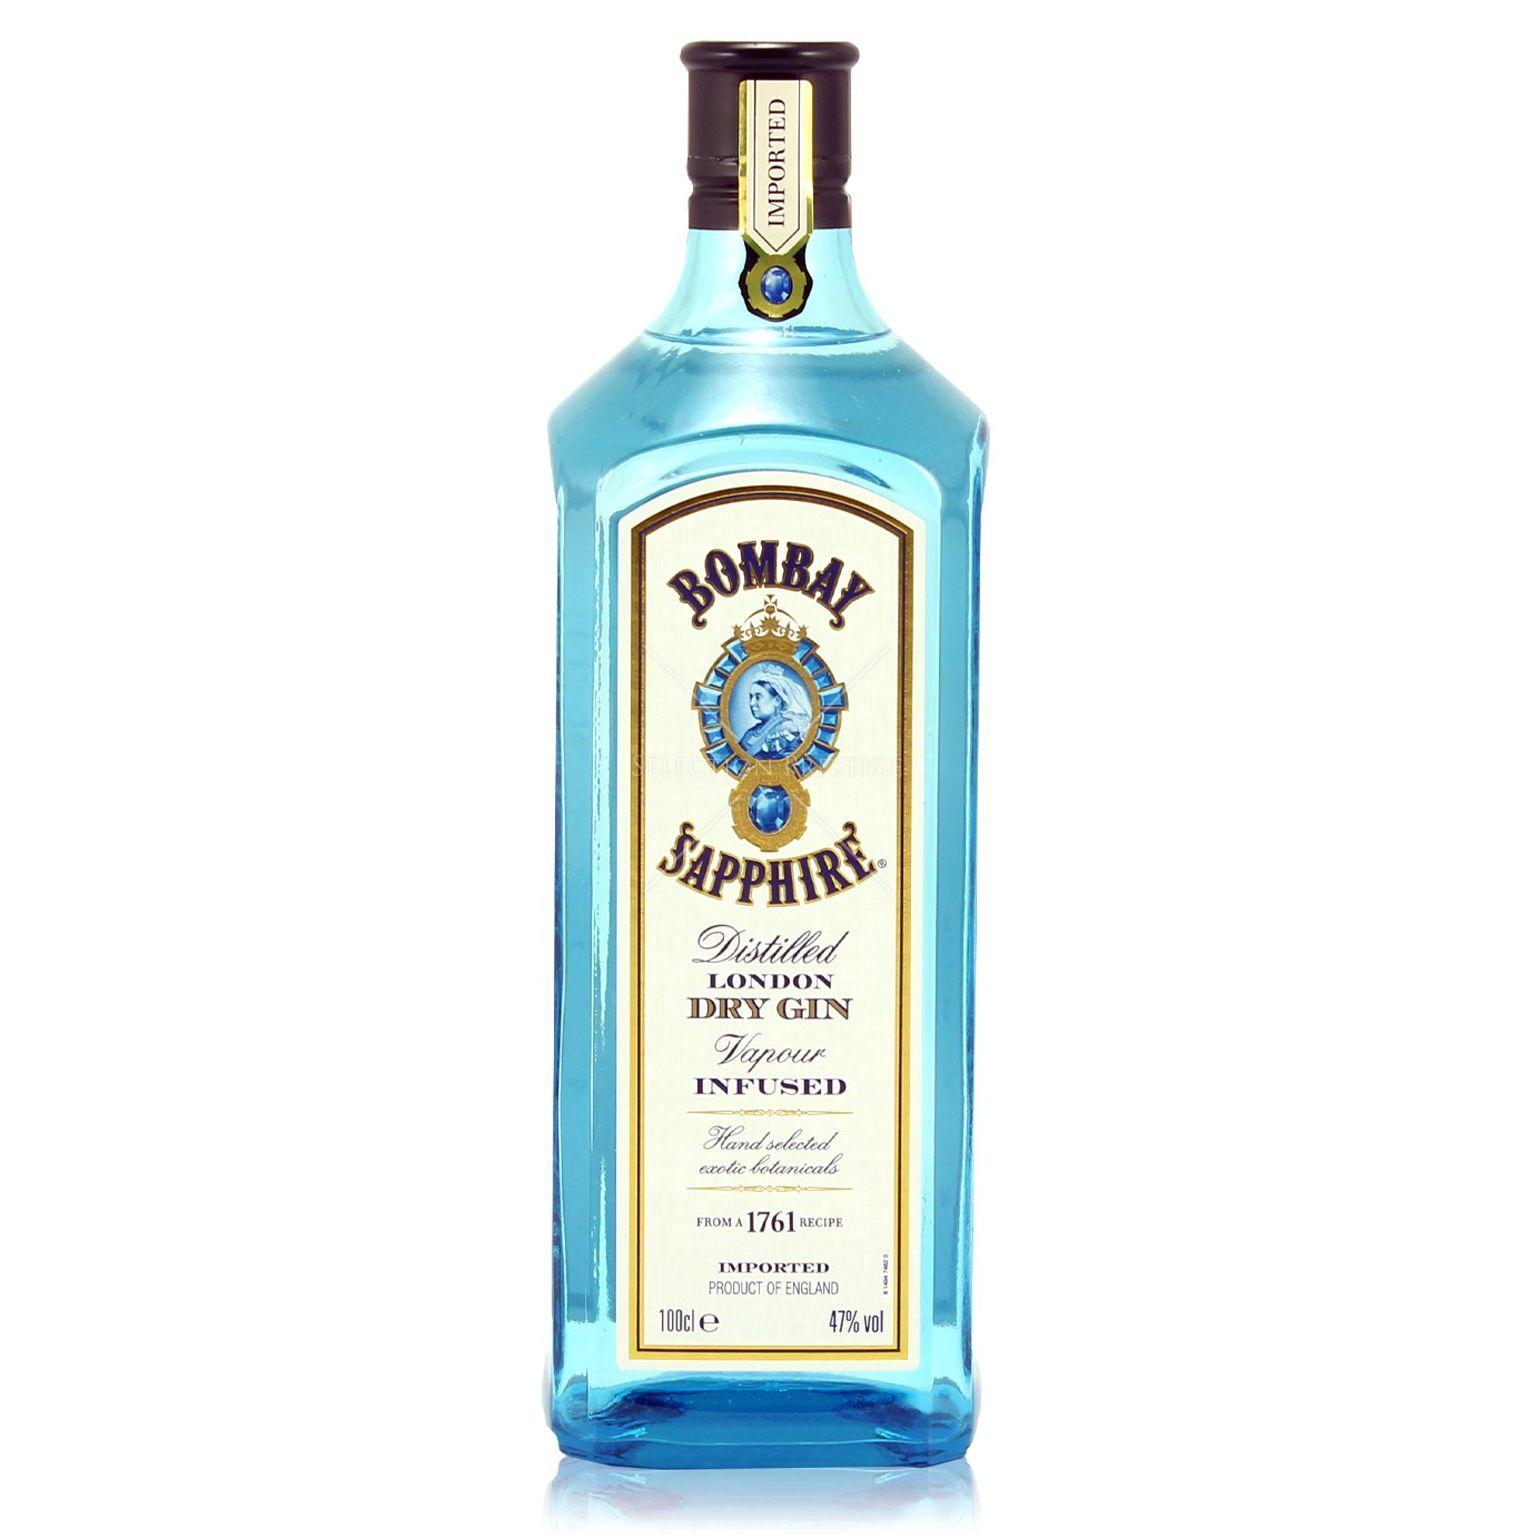 Bombay Original Dry Gin 1.0L (47% Vol.)